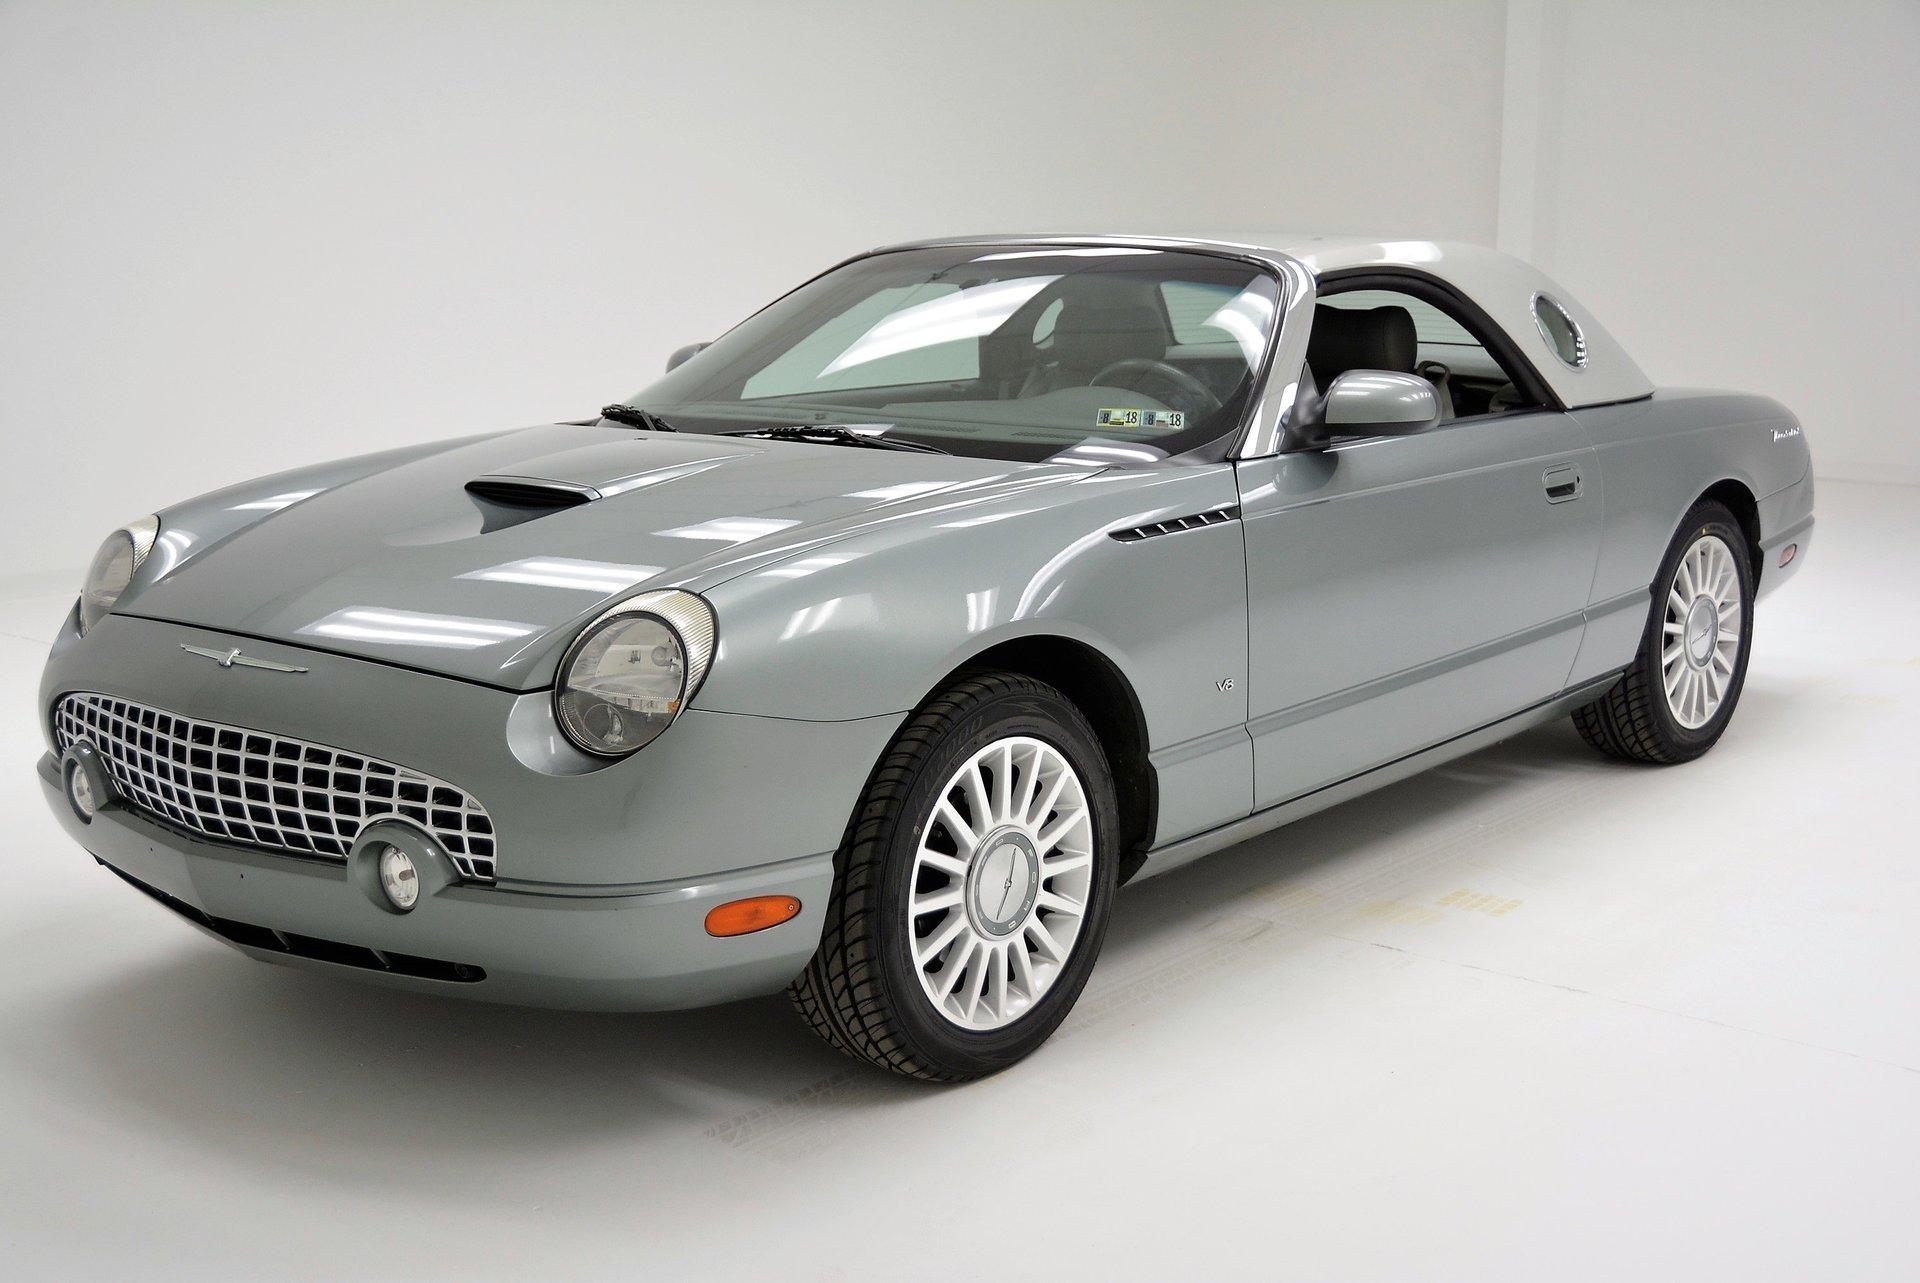 2004 Ford Thunderbird